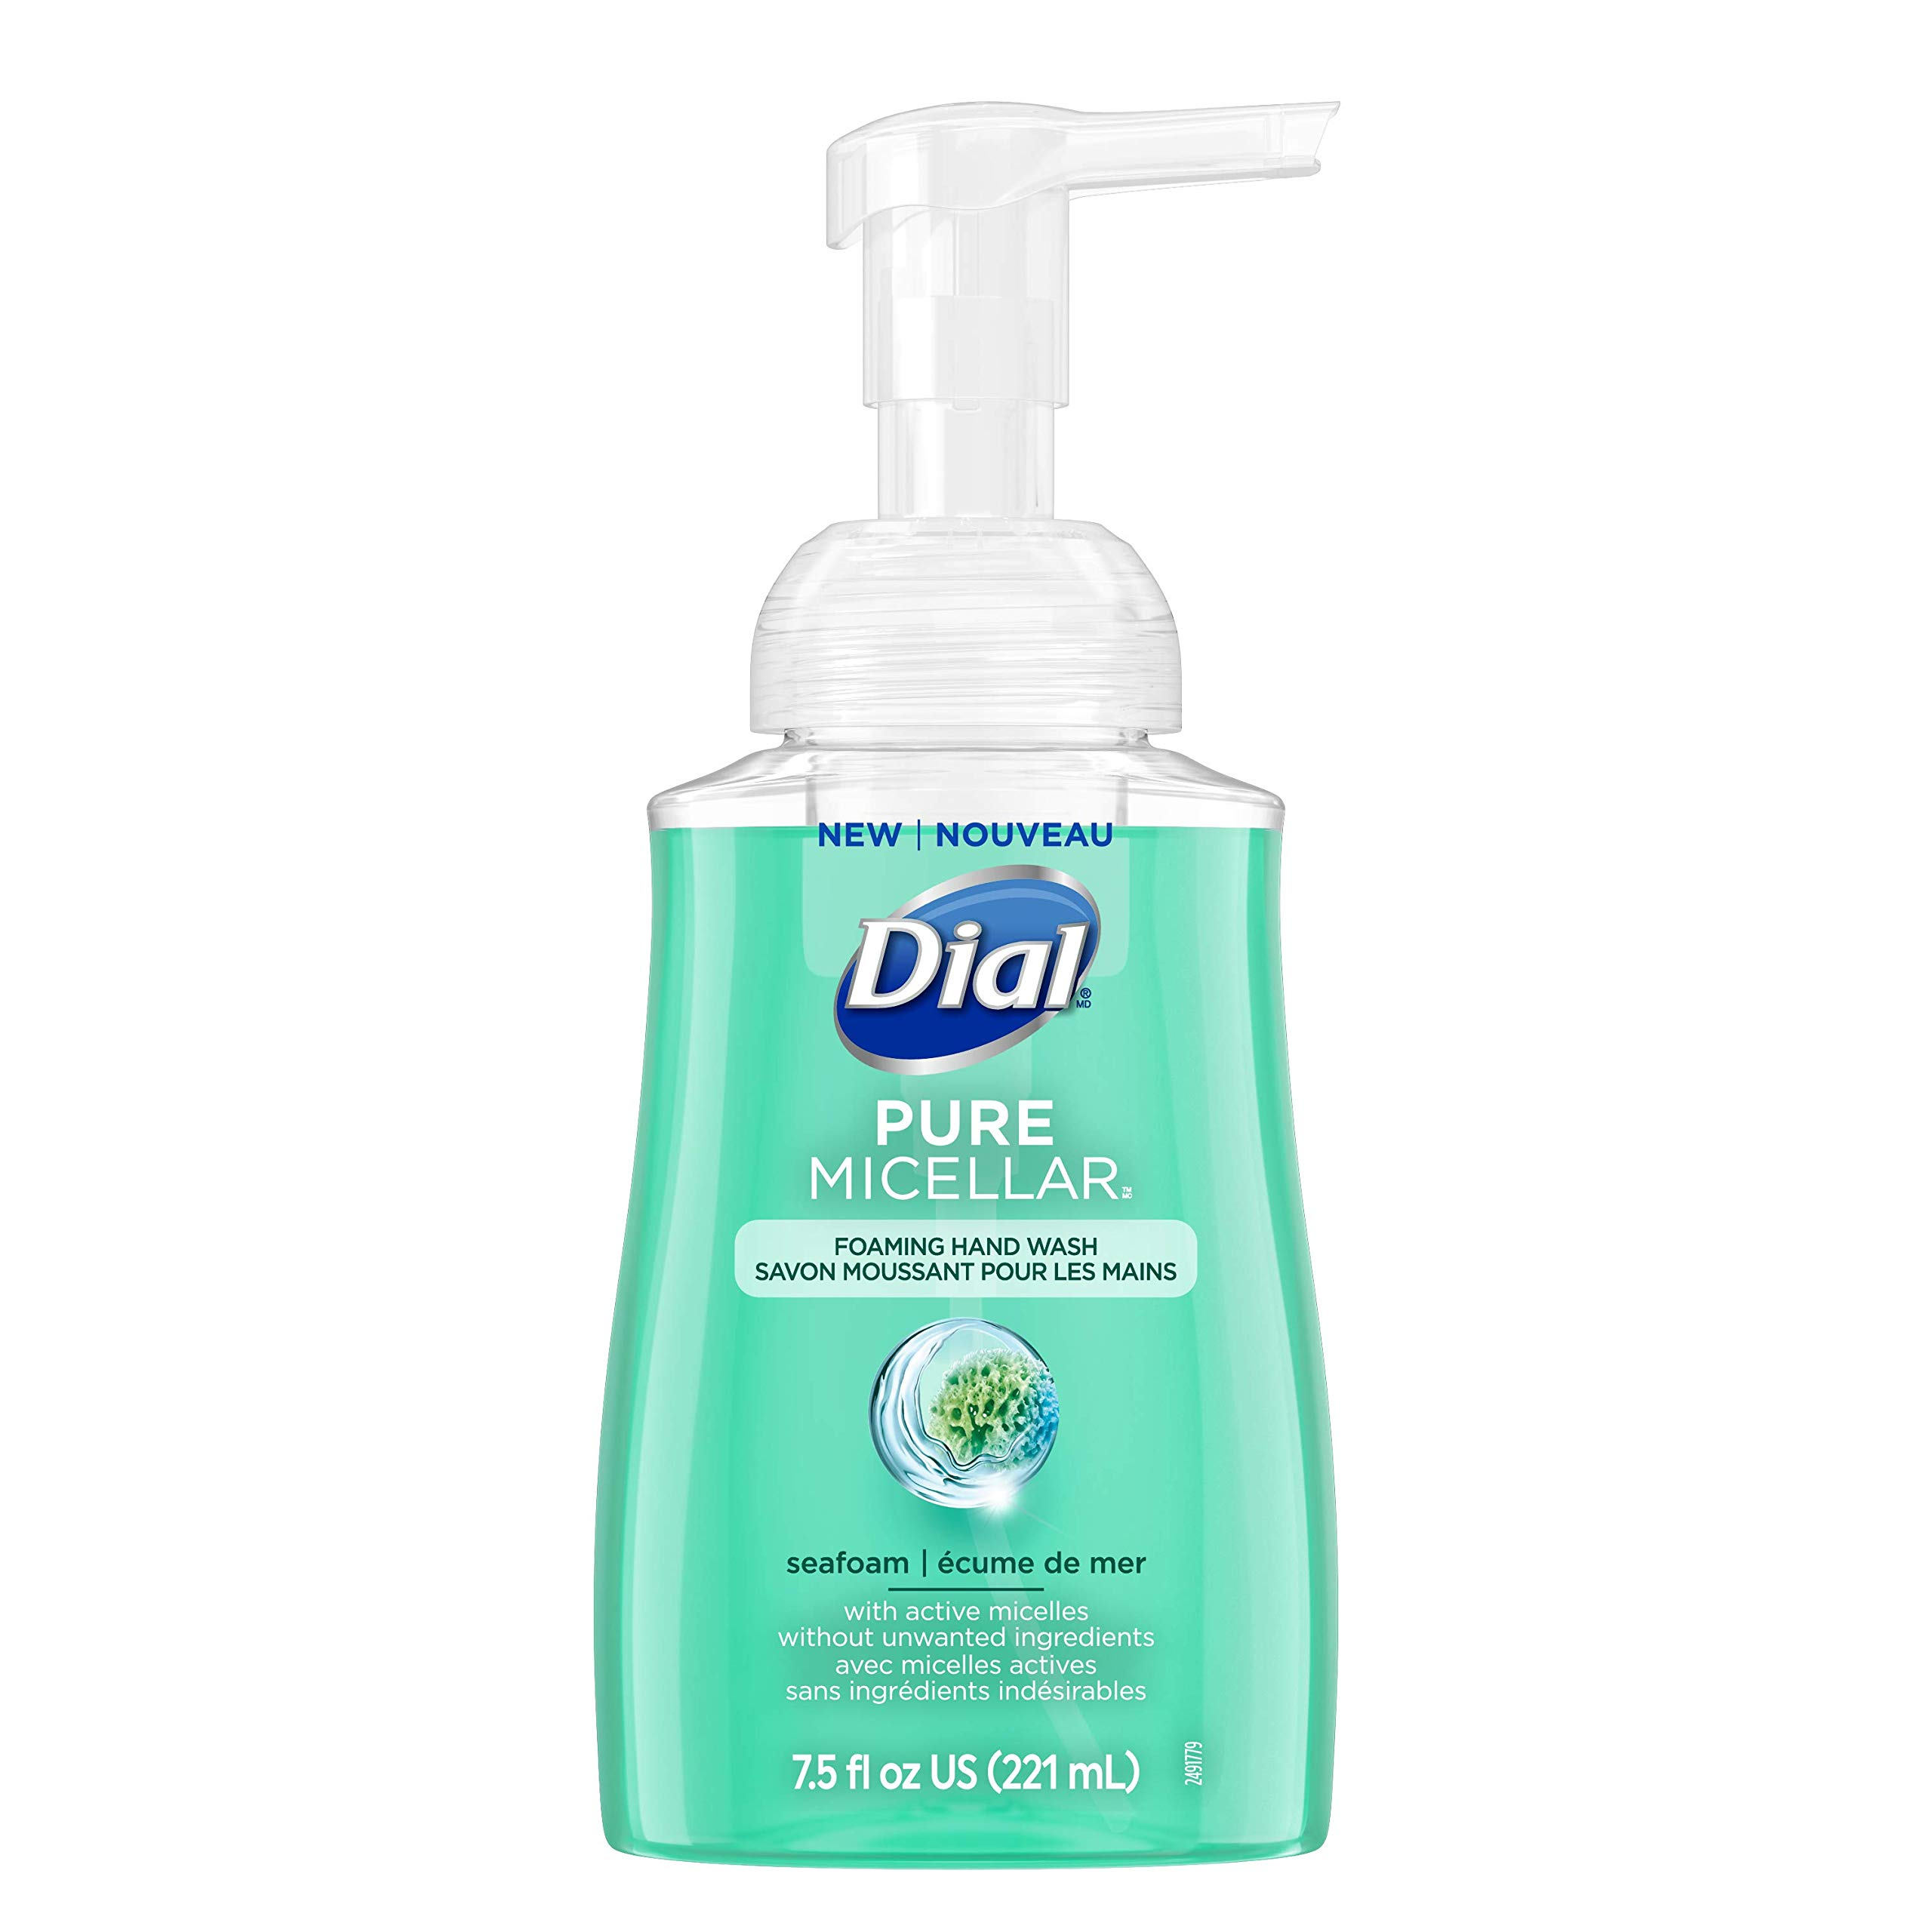 Dial Pure Micellar Foaming Hand Soap, Seafoam, 7.5 Ounce